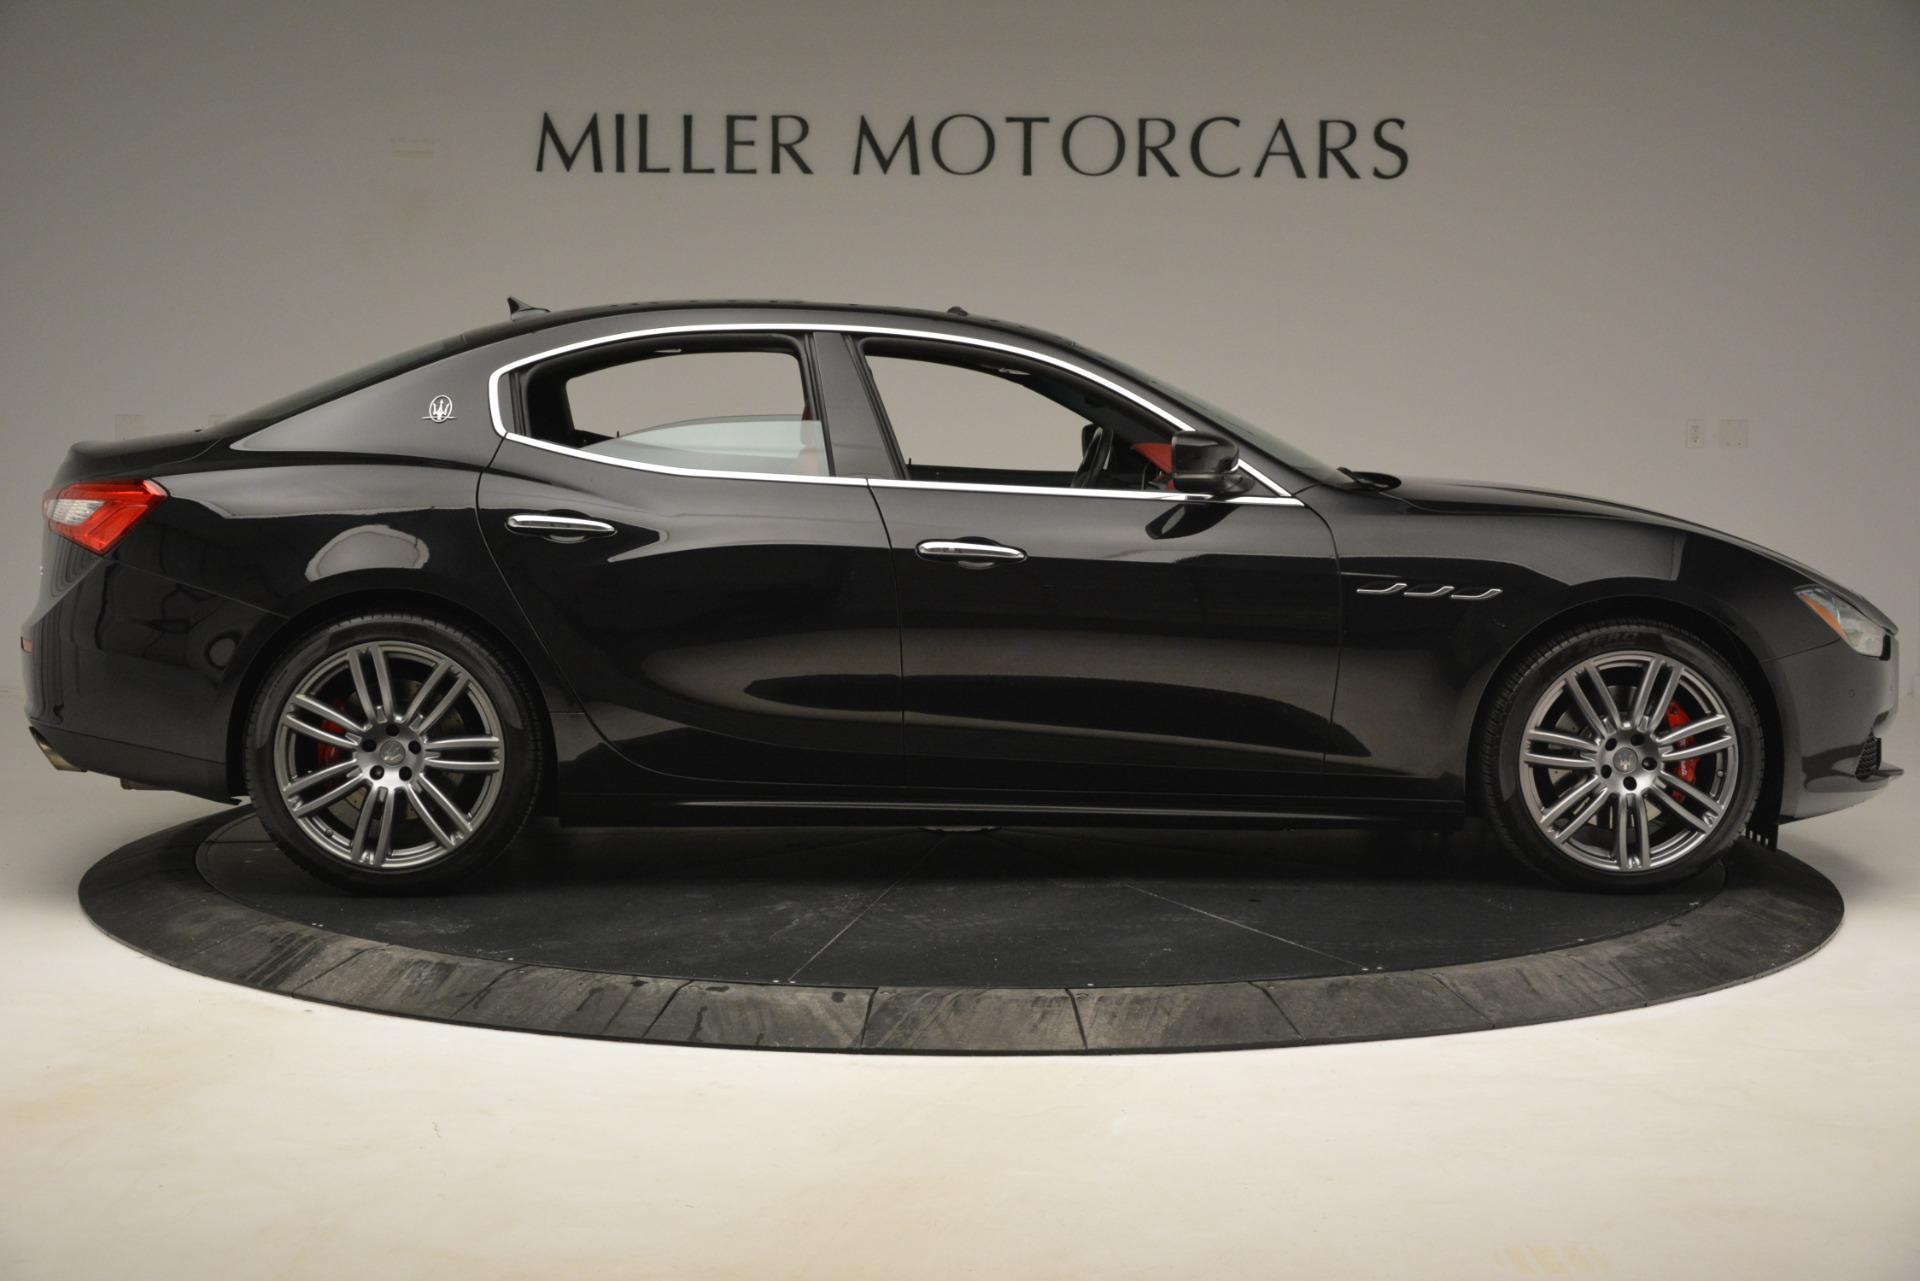 Used 2016 Maserati Ghibli S Q4 For Sale In Greenwich, CT 2945_p11